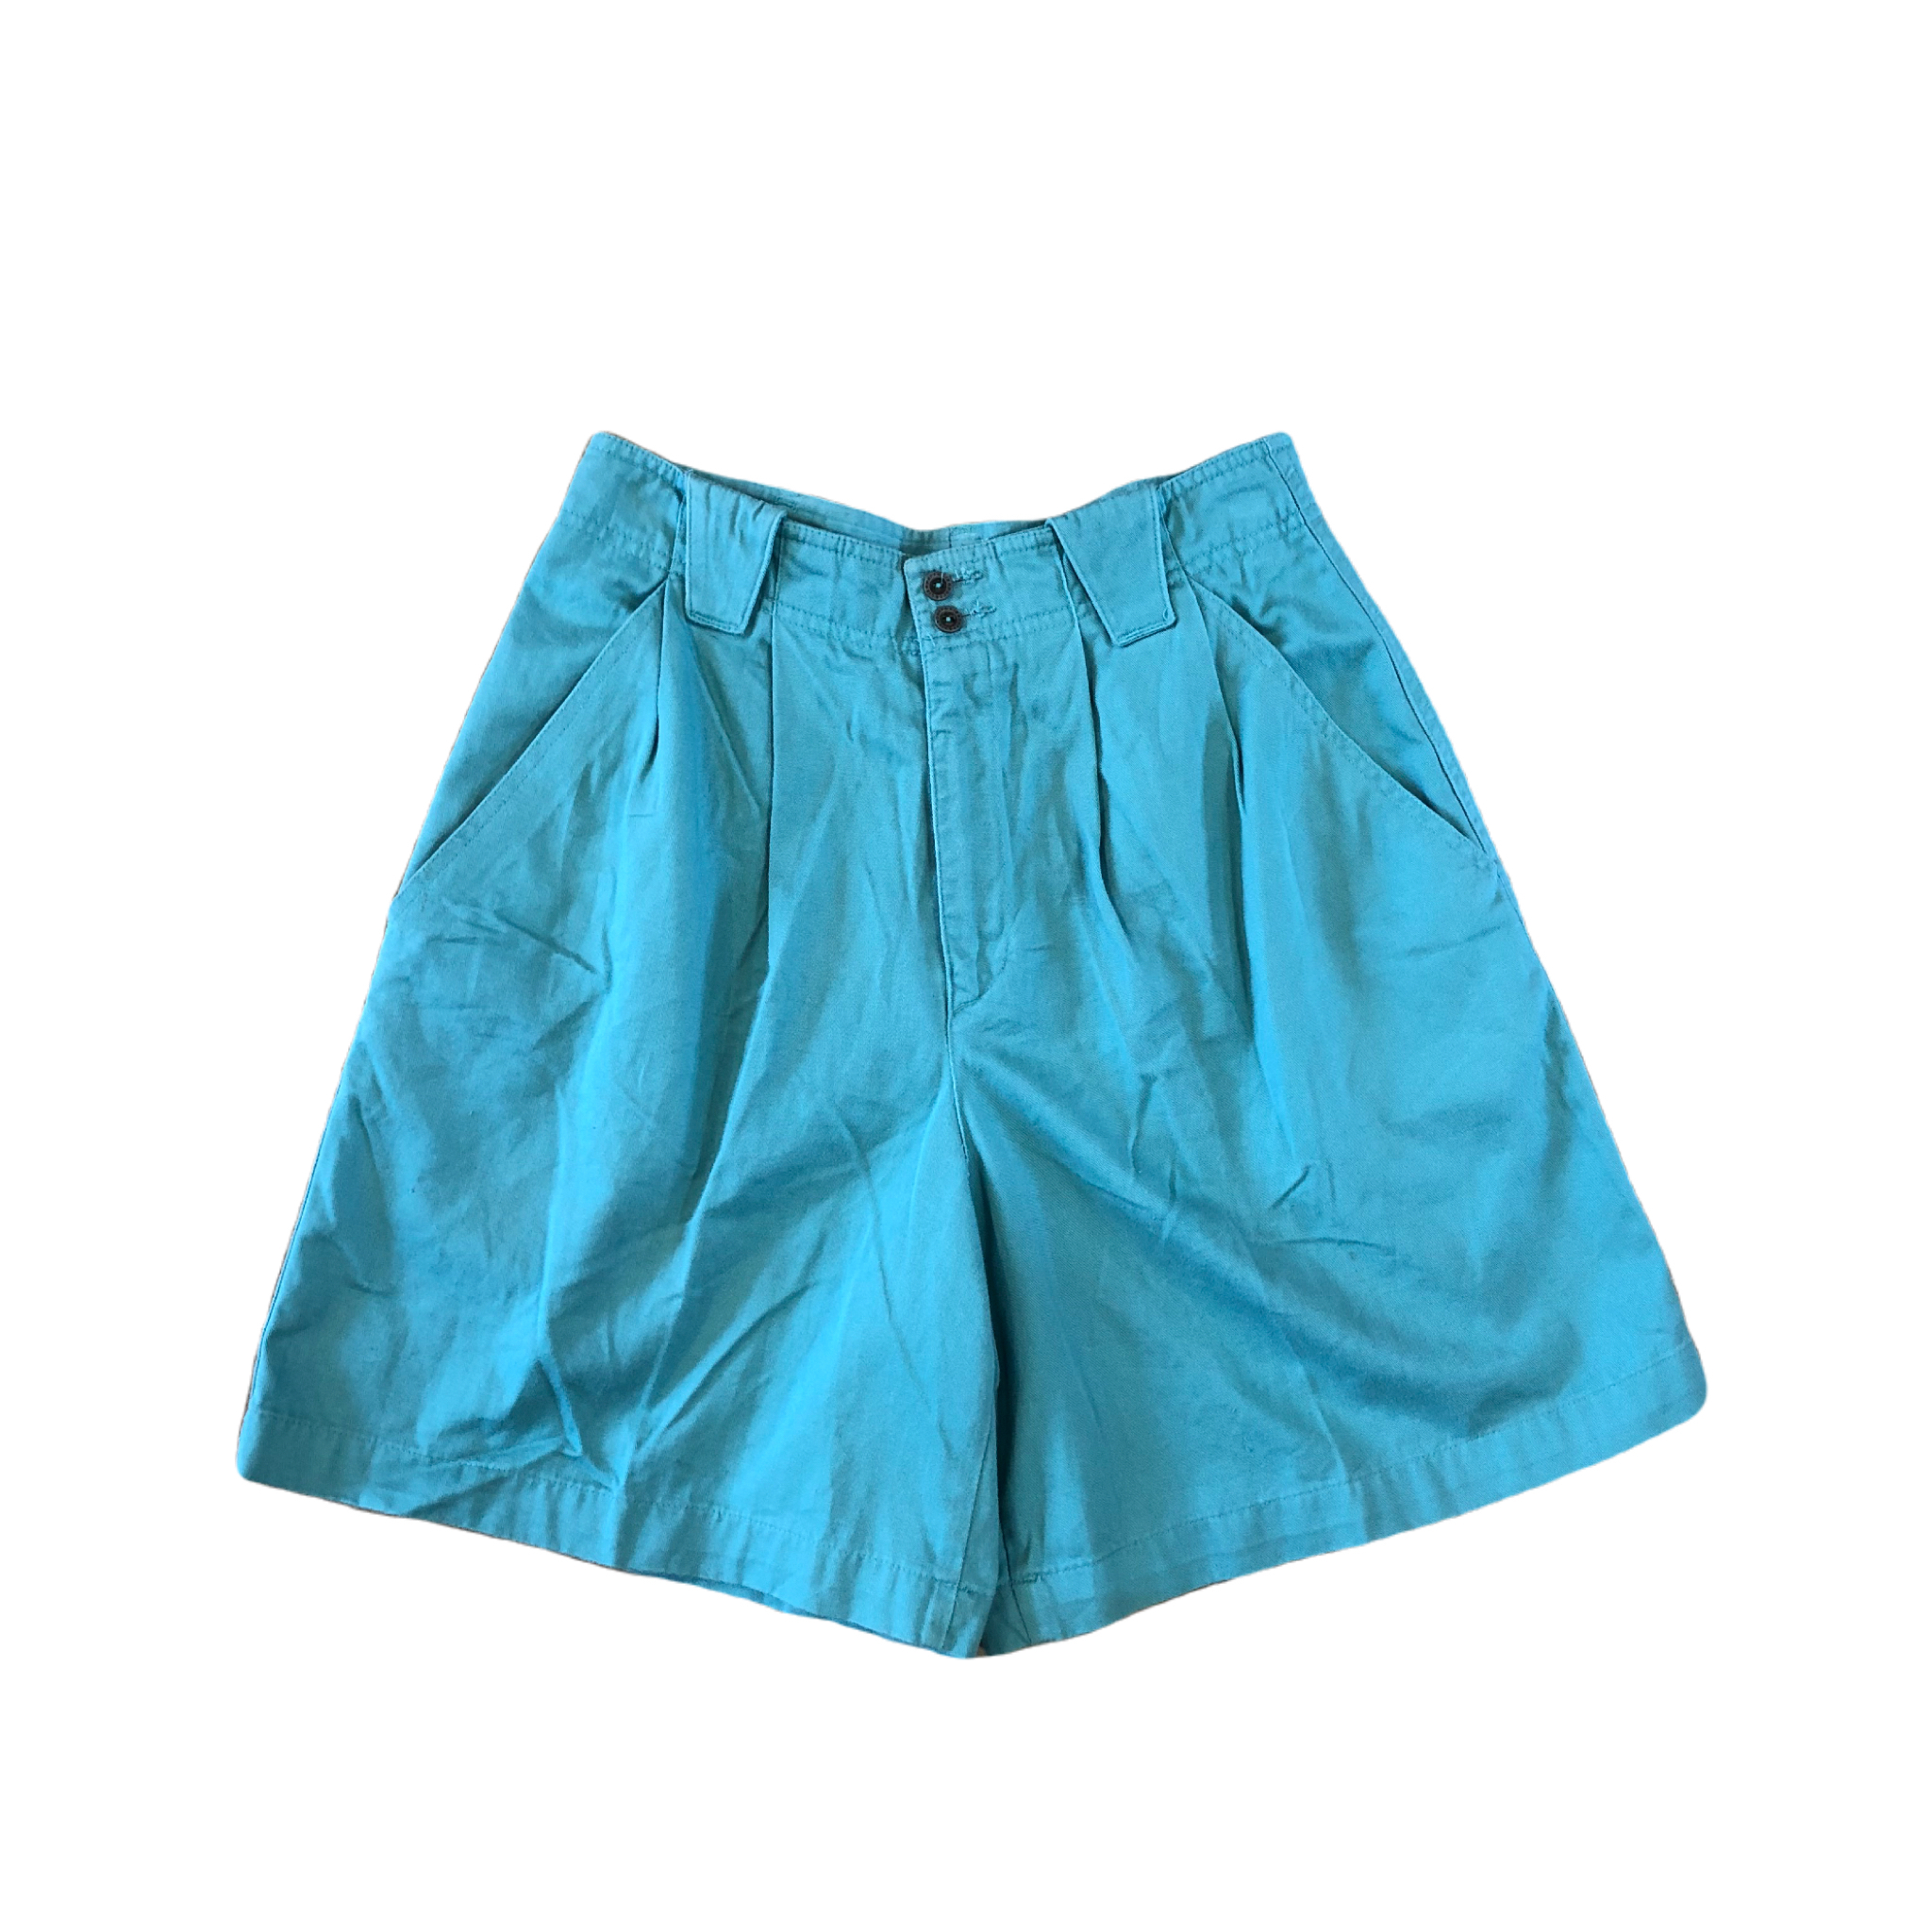 Liz Sport Short Pants ¥4,900+tax